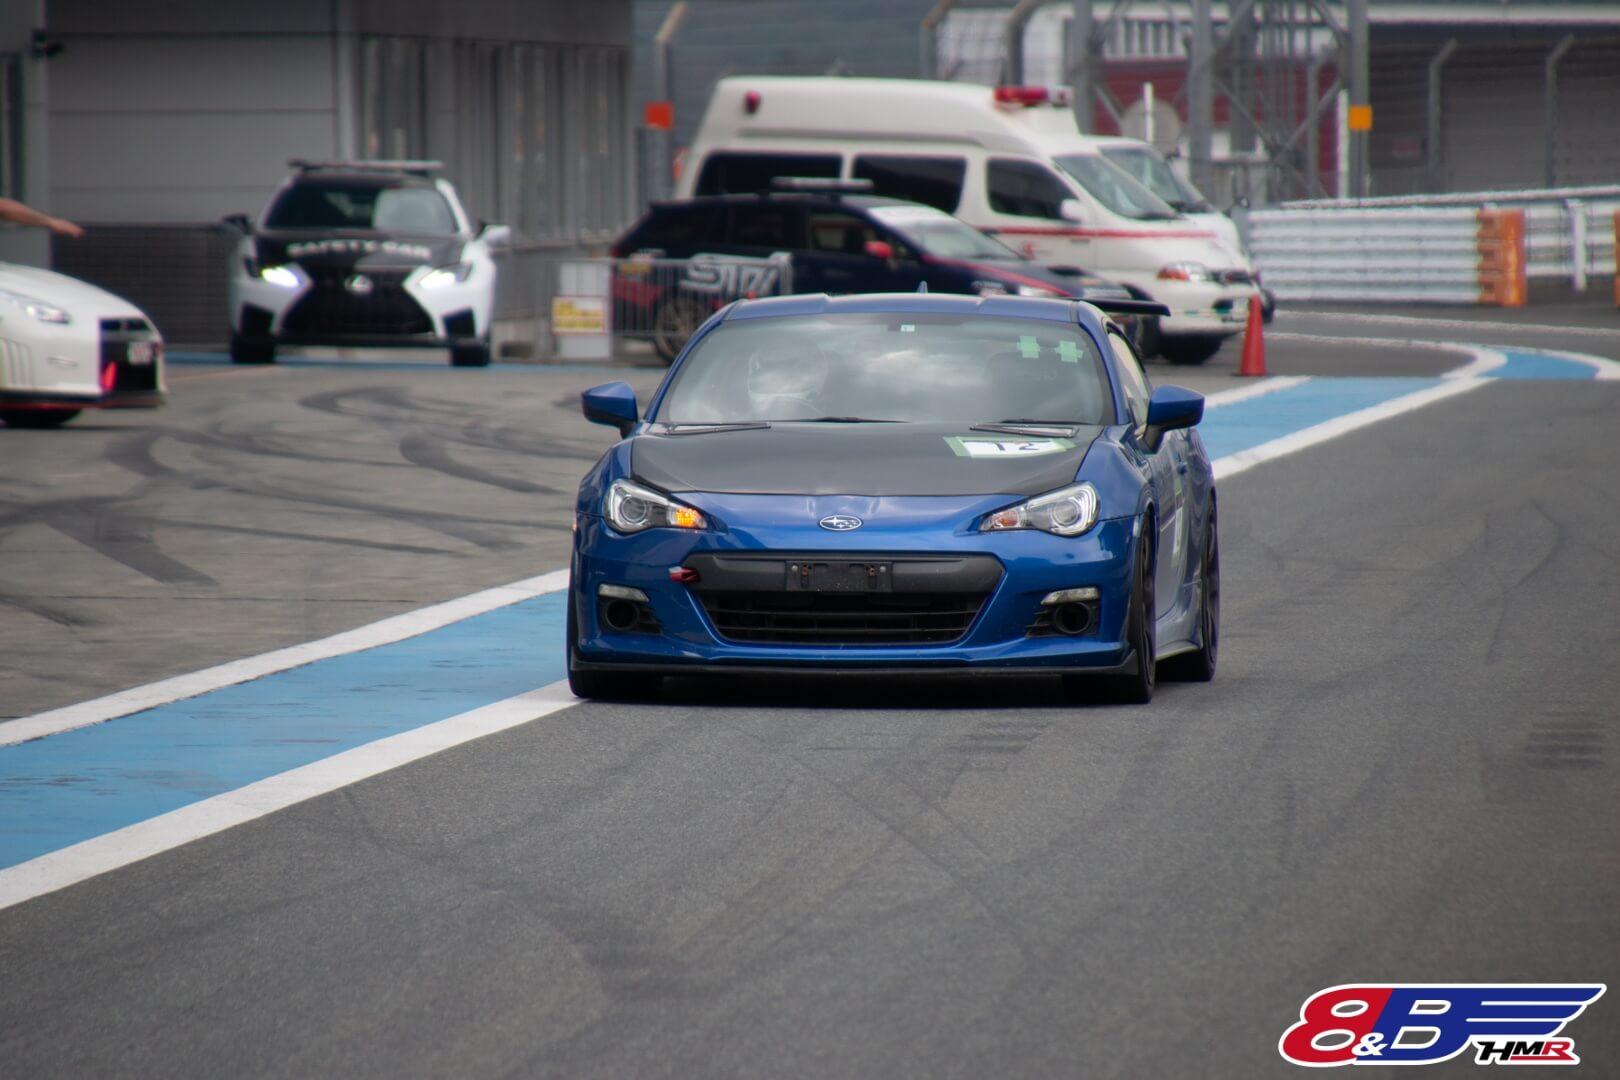 Fuji1-GP BRZ